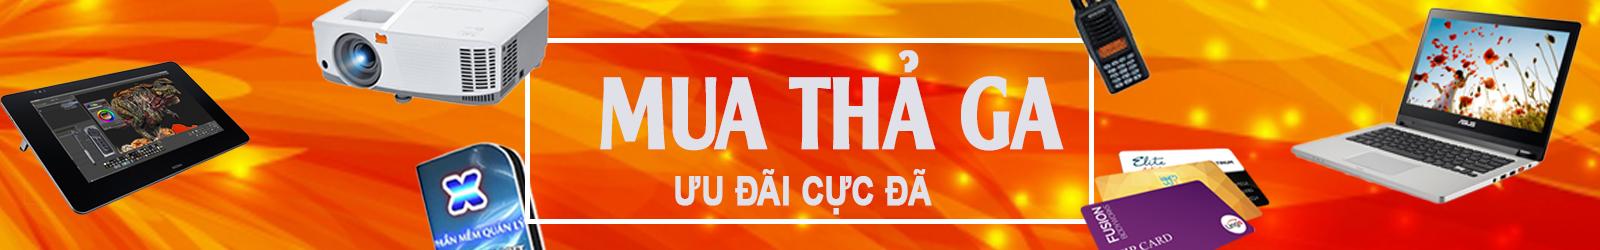 Banner Image